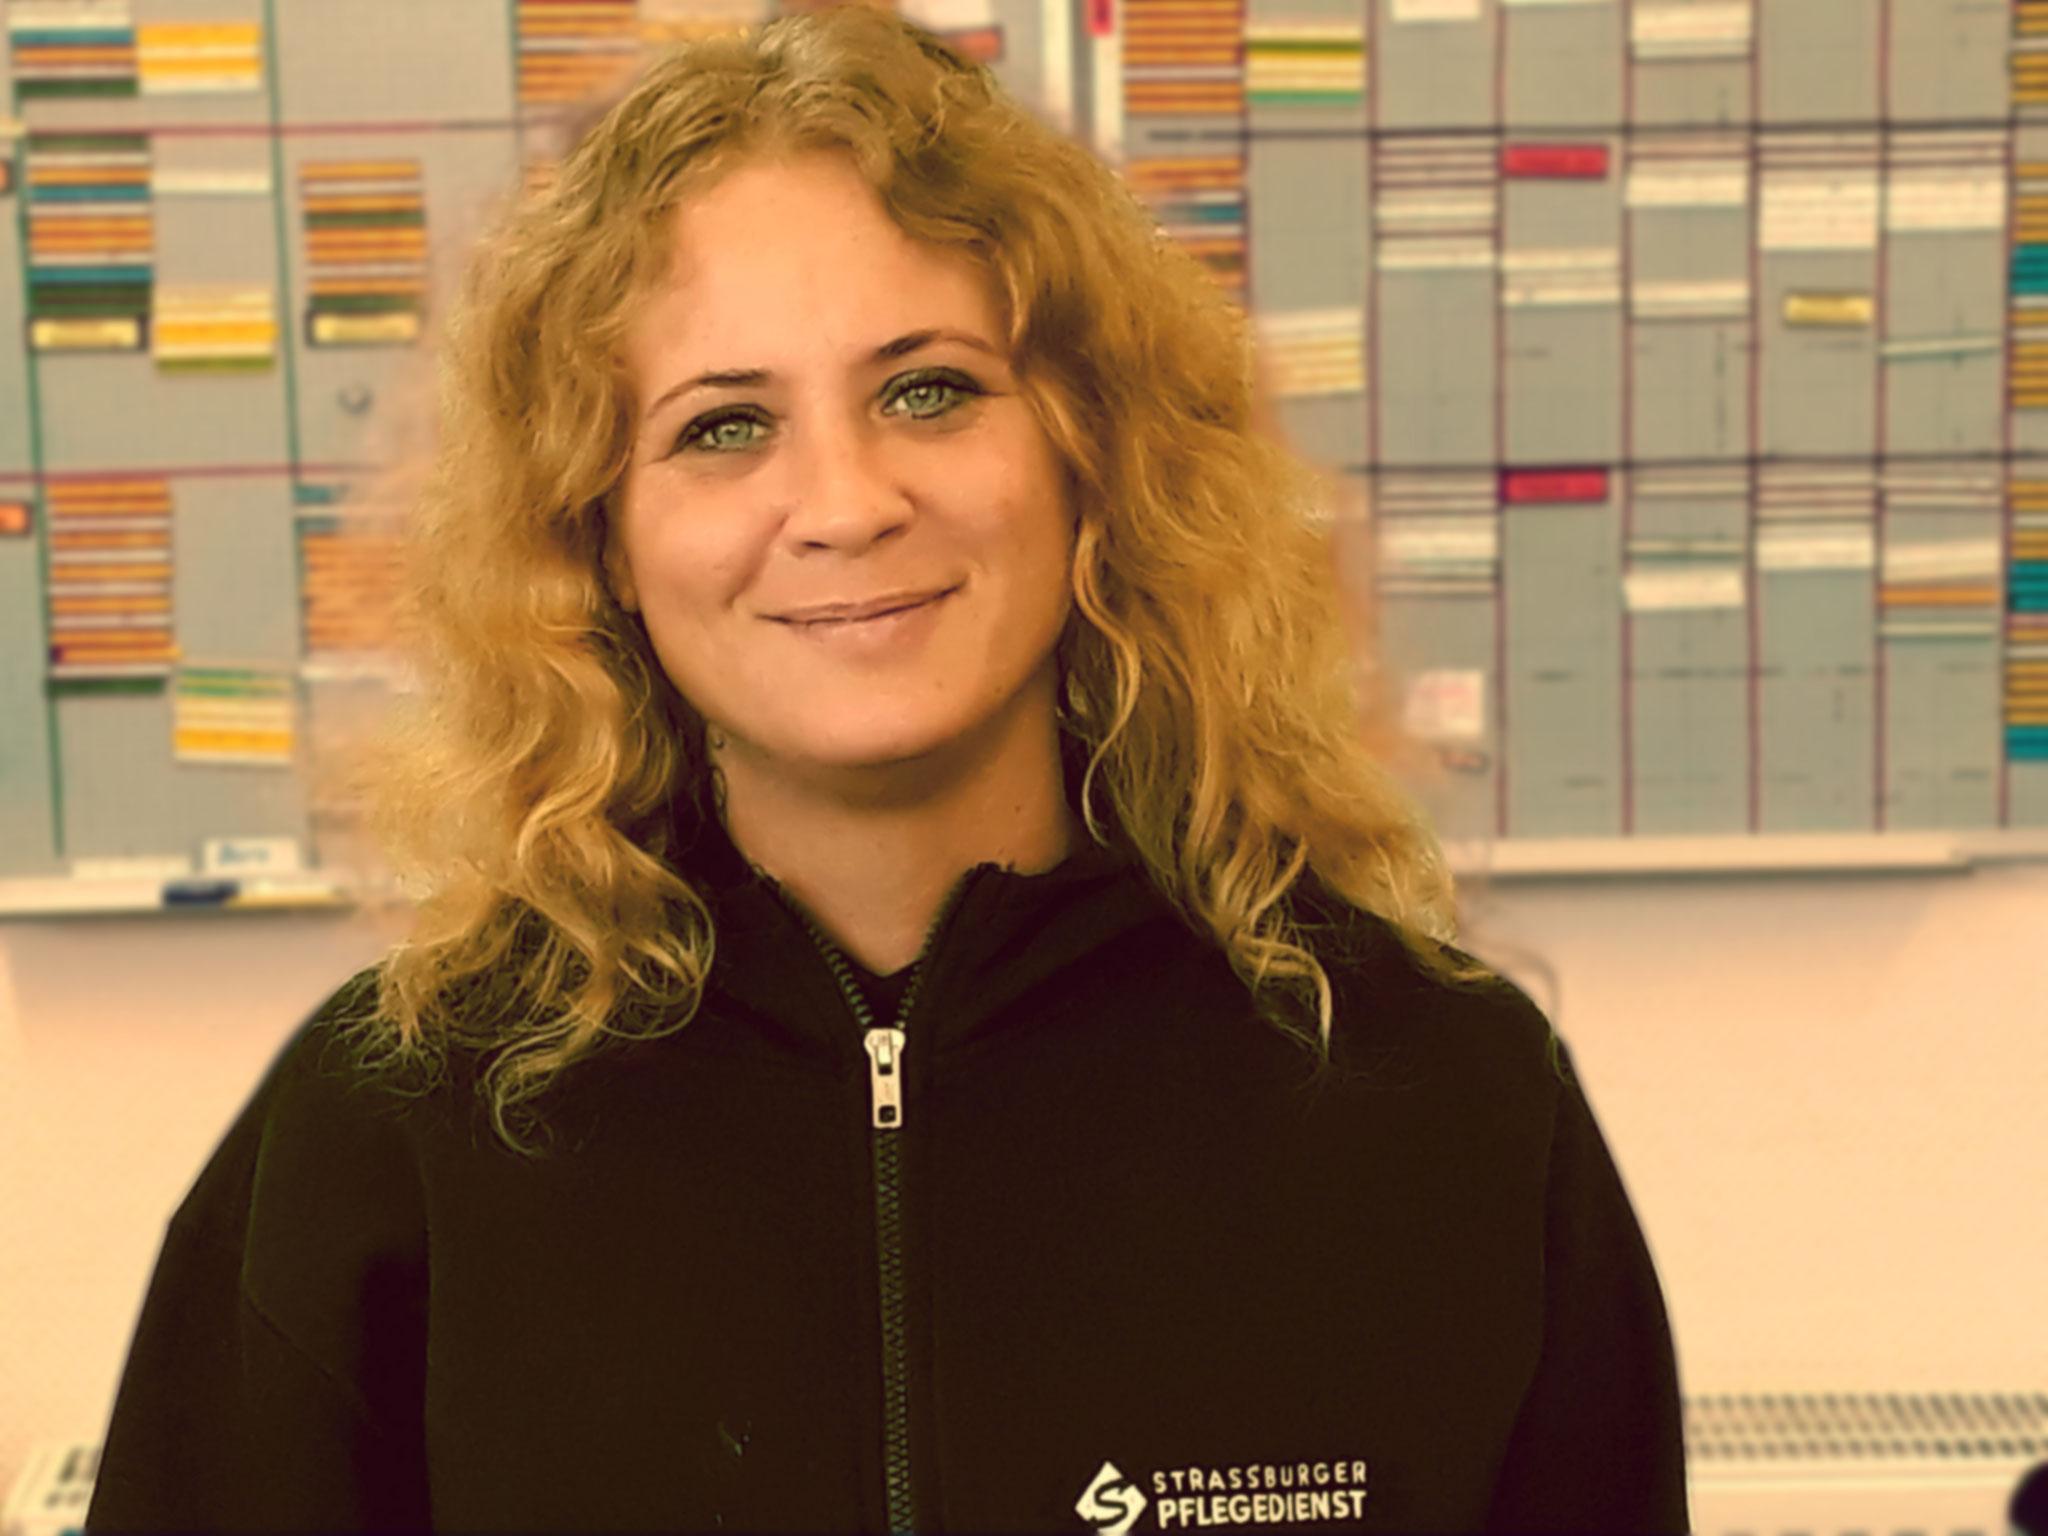 Nadine Schulz, ang. Pflegekraft